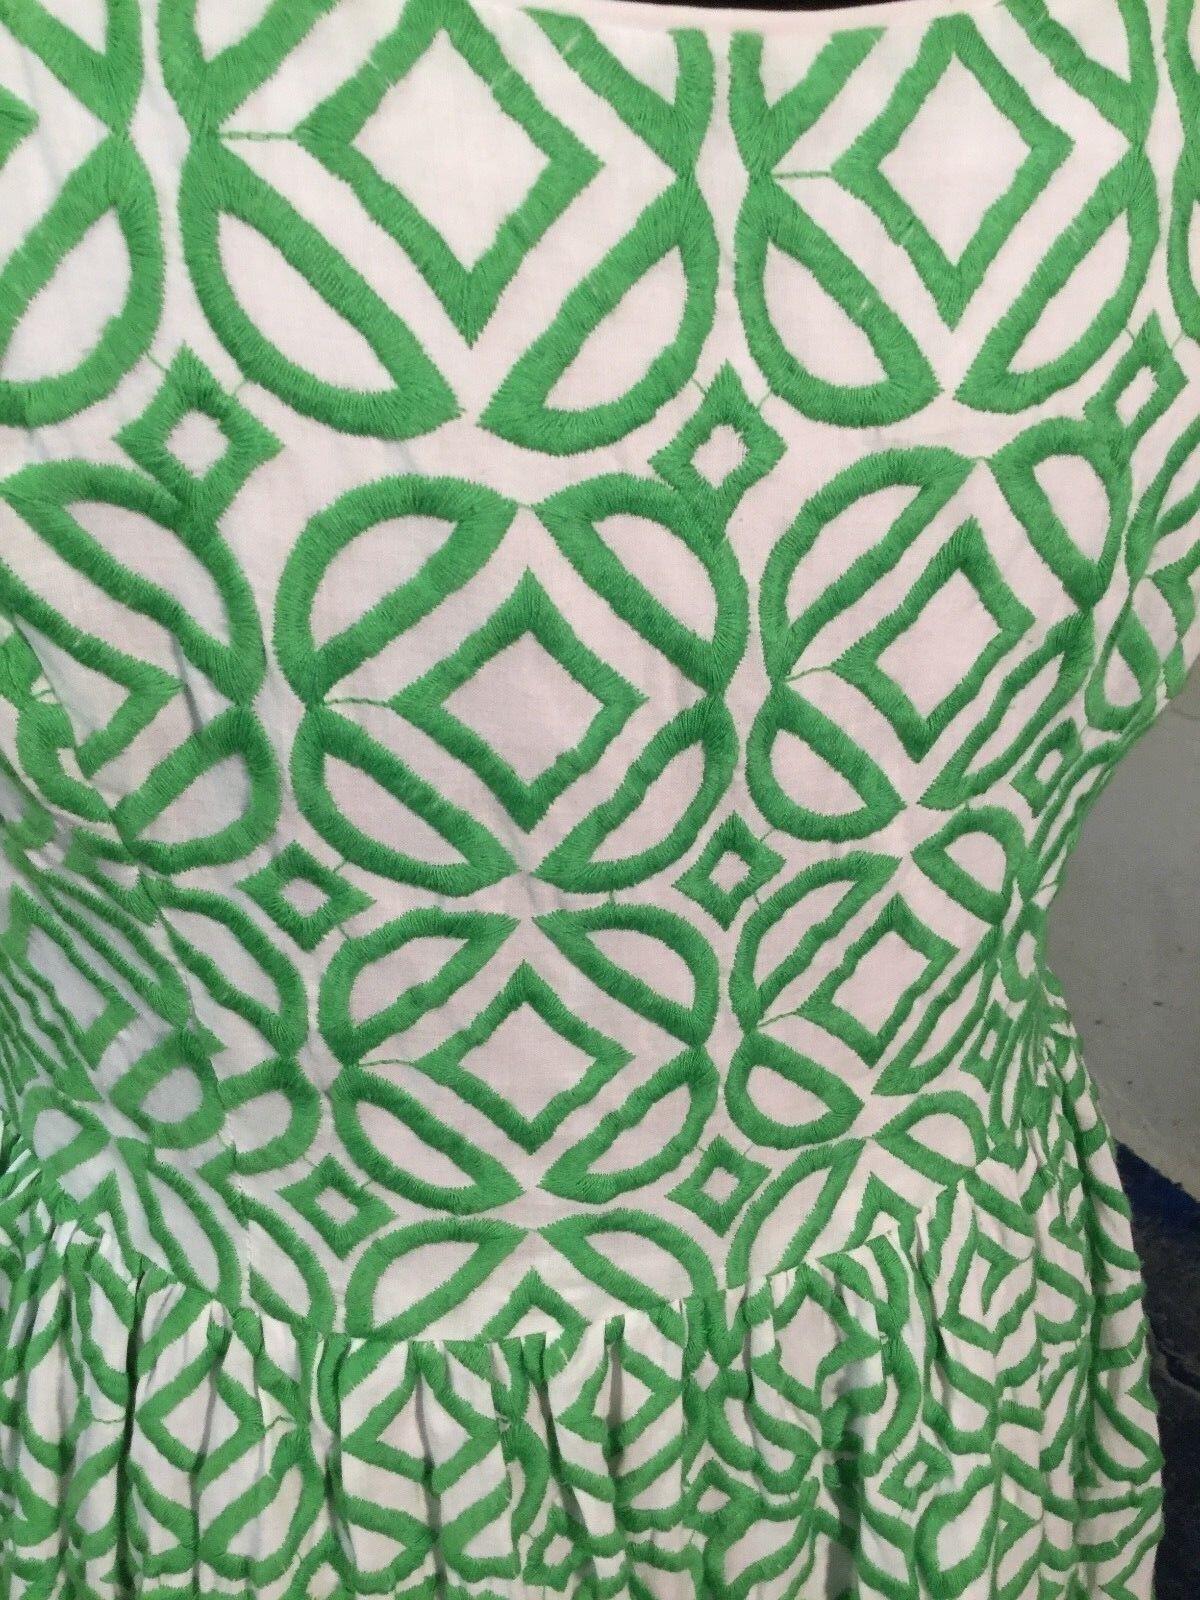 women Morgan Cloister Cafe Tea Dress Green Green Green White 10 e92383